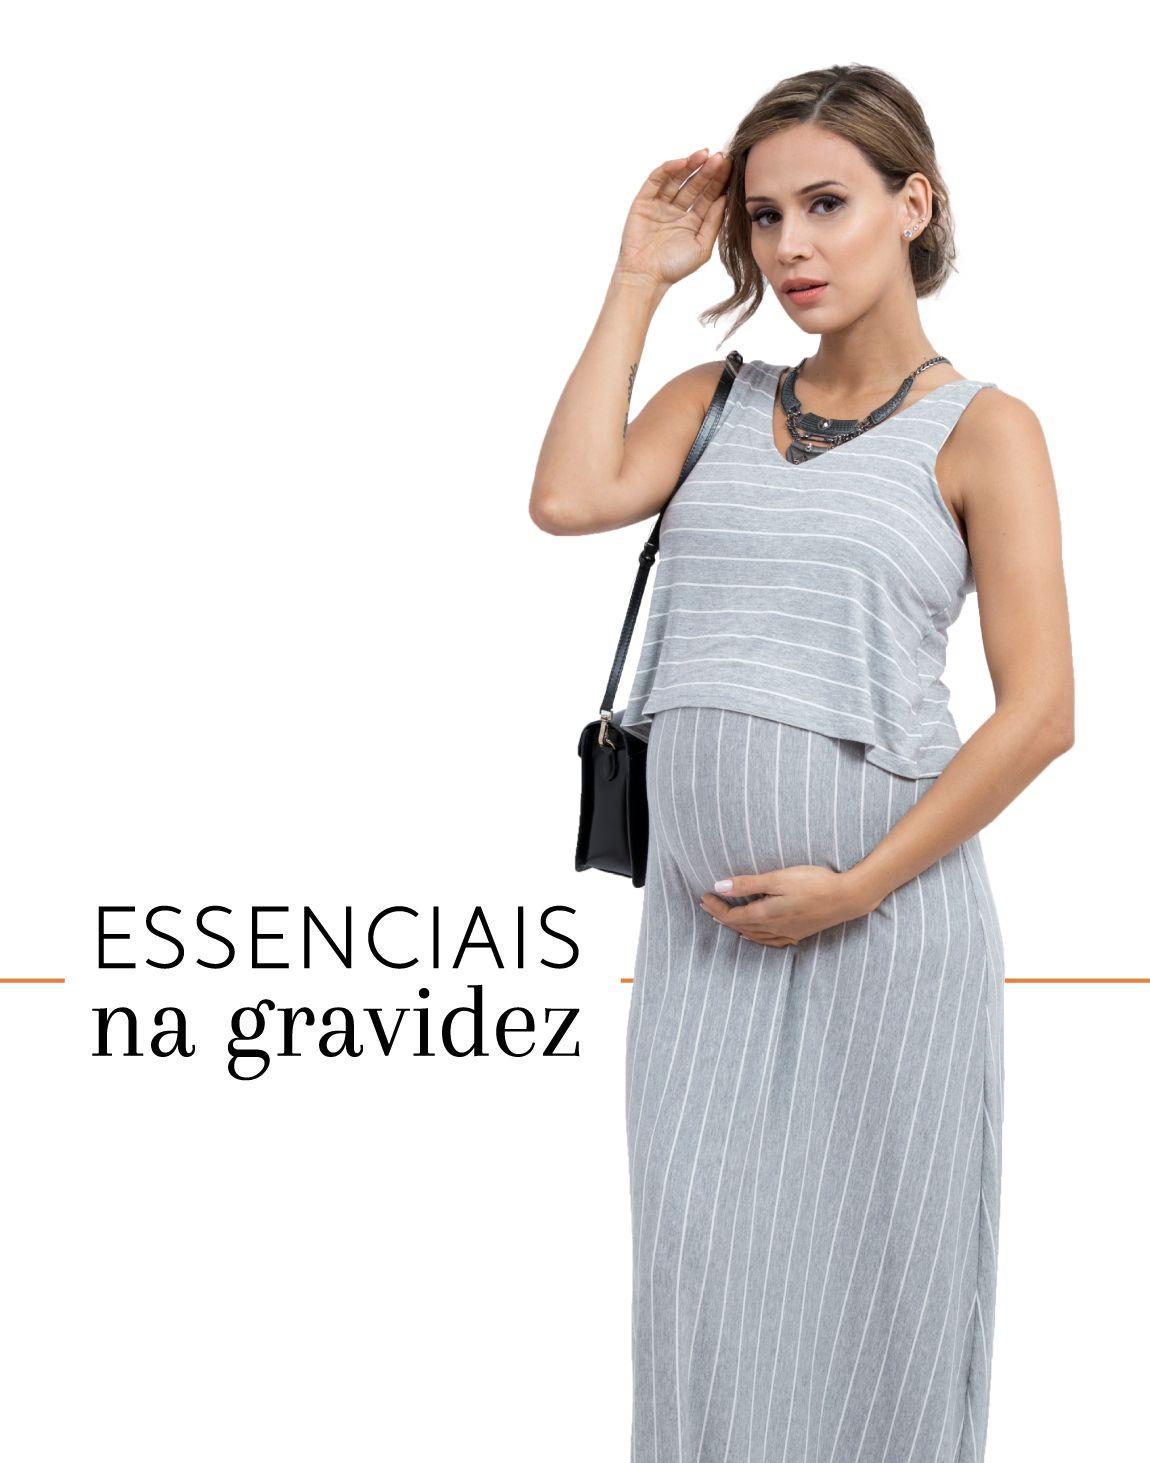 cdb50458f Guia rápido para grávidas